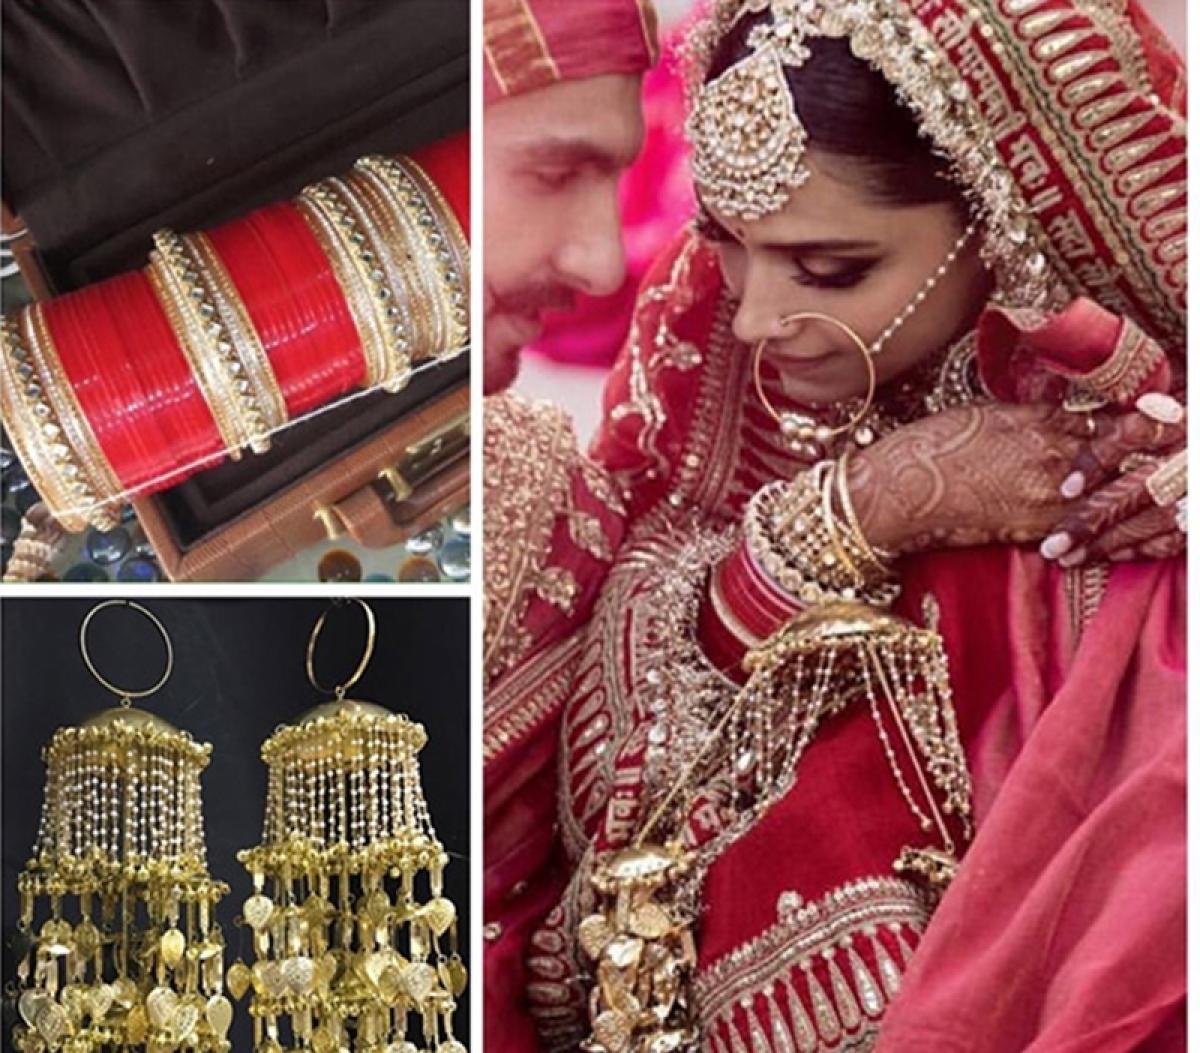 #DeepVeerkishaddi: Asneak peek at Deepika's stunning Punjabi Chura and Kaleeras!